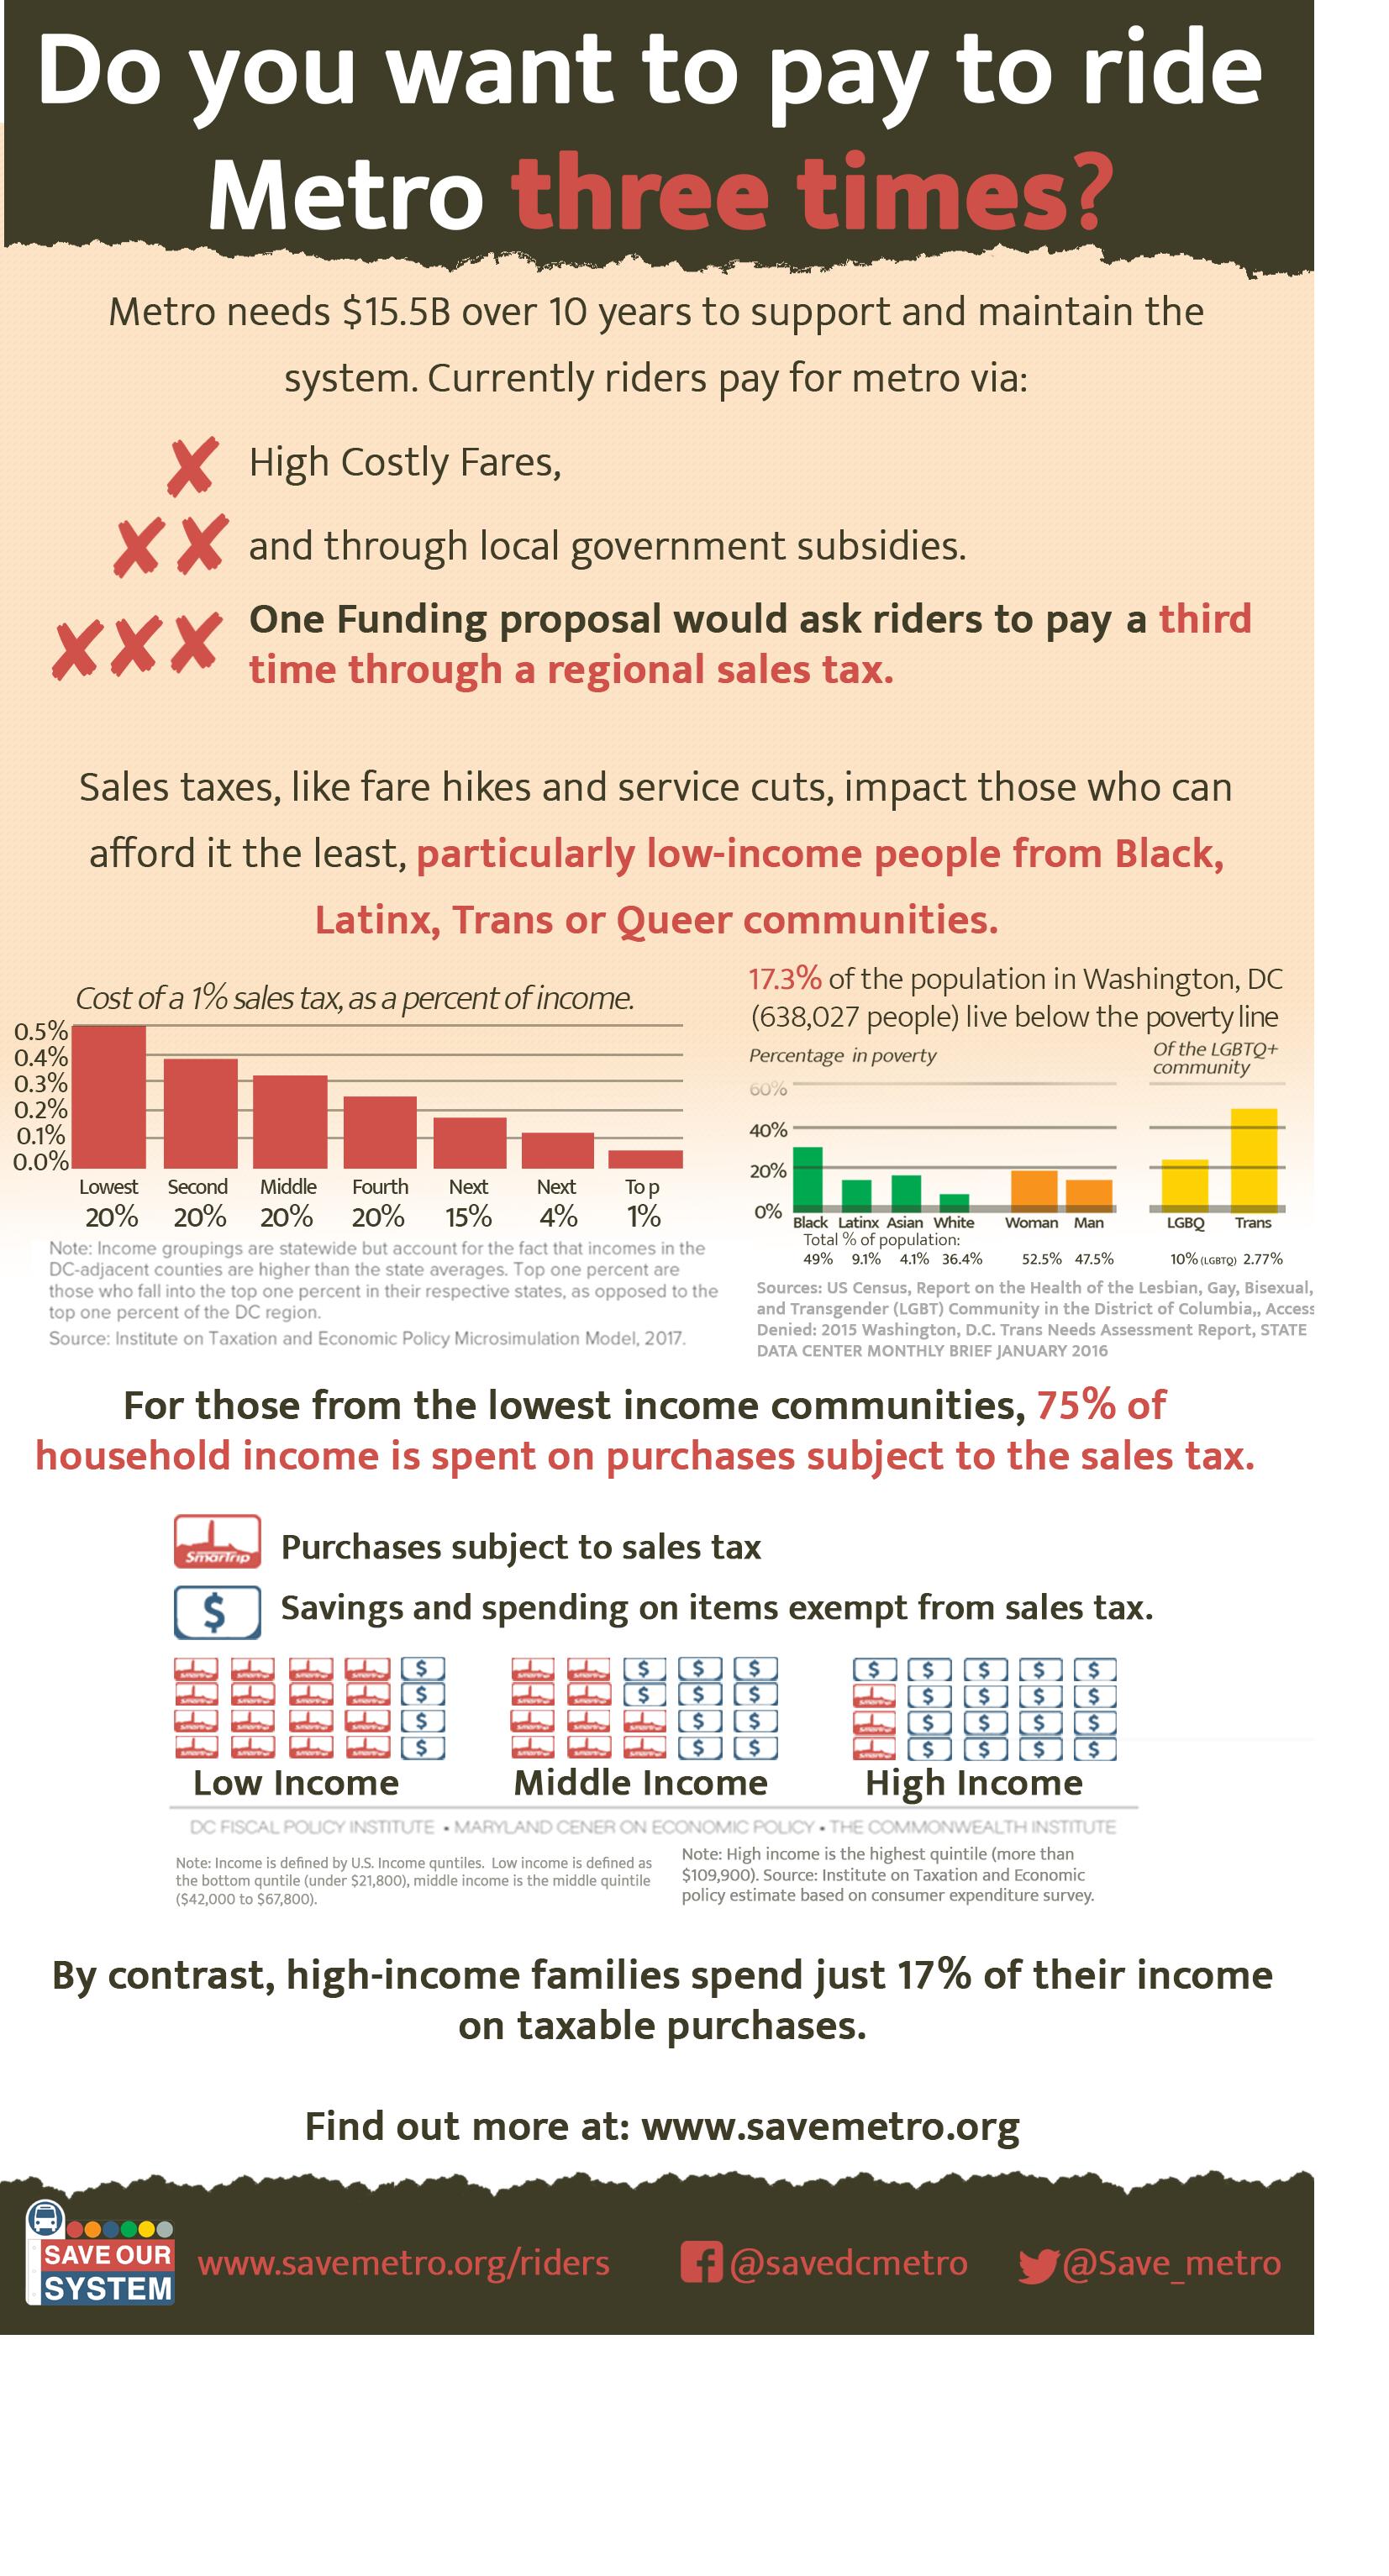 salestax2.png